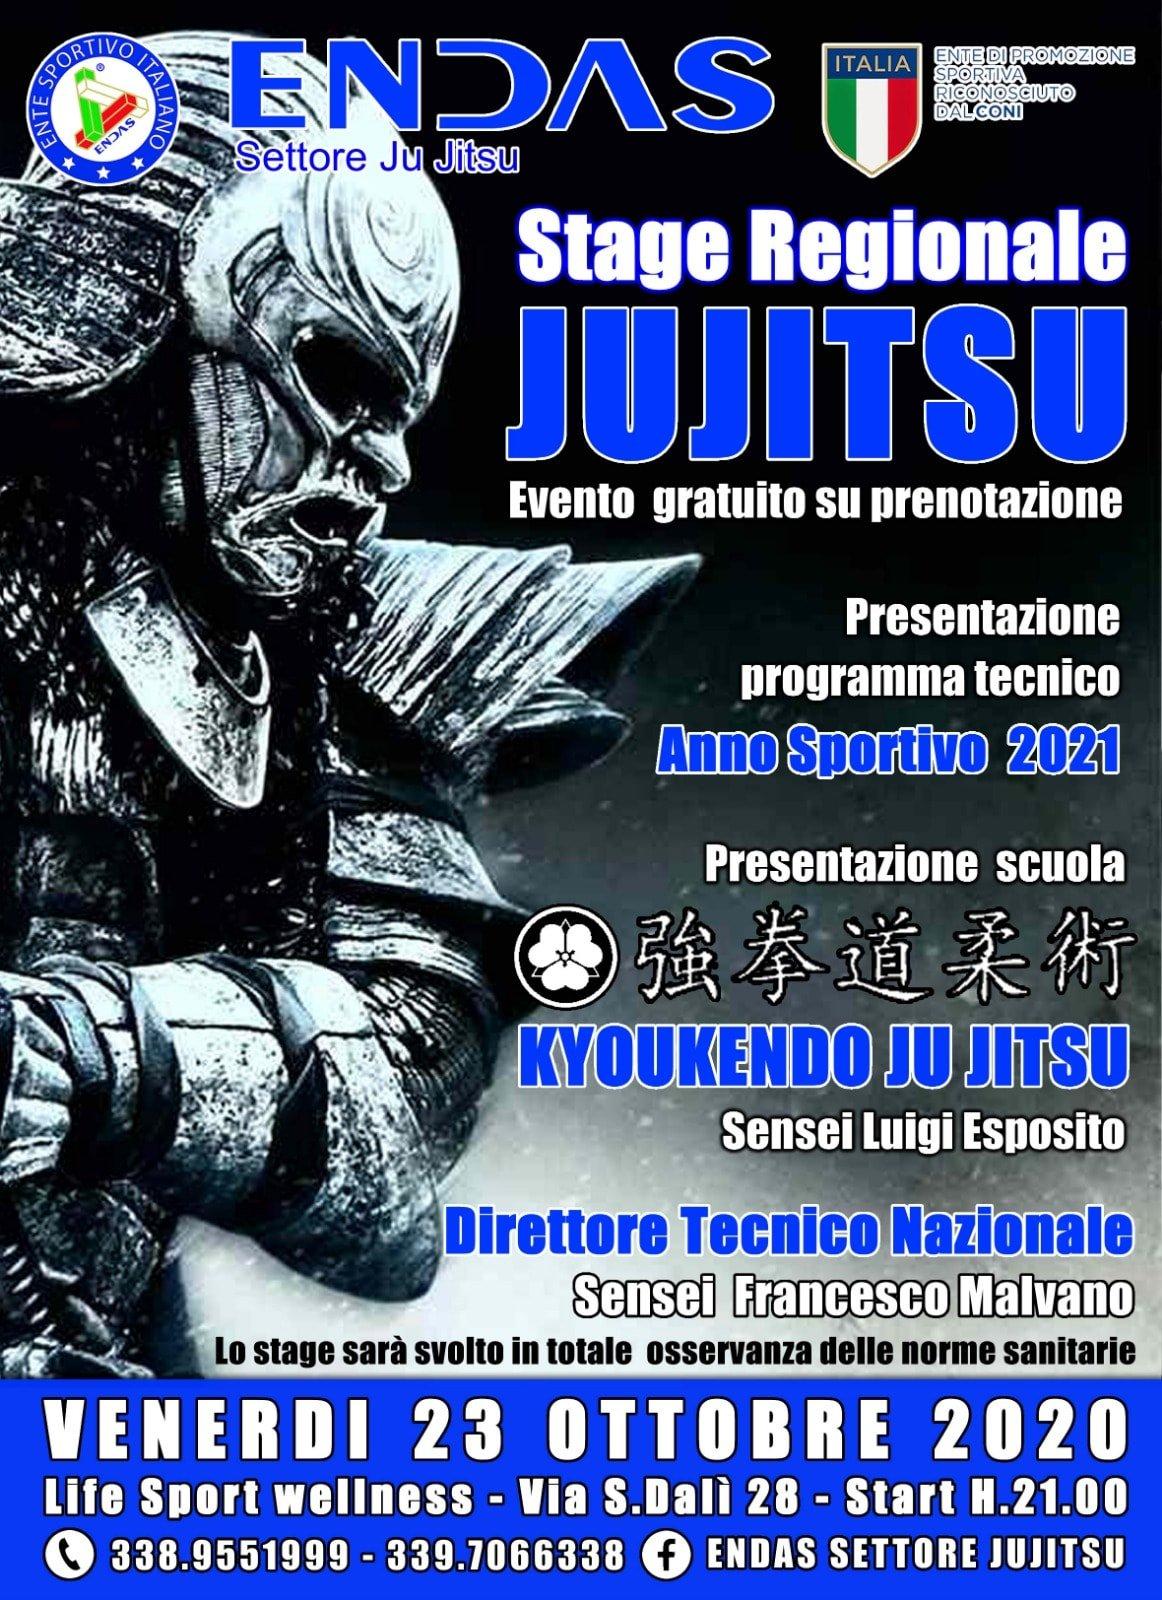 Stage Regionale Jujitsu ENDAS 23 Ottobre